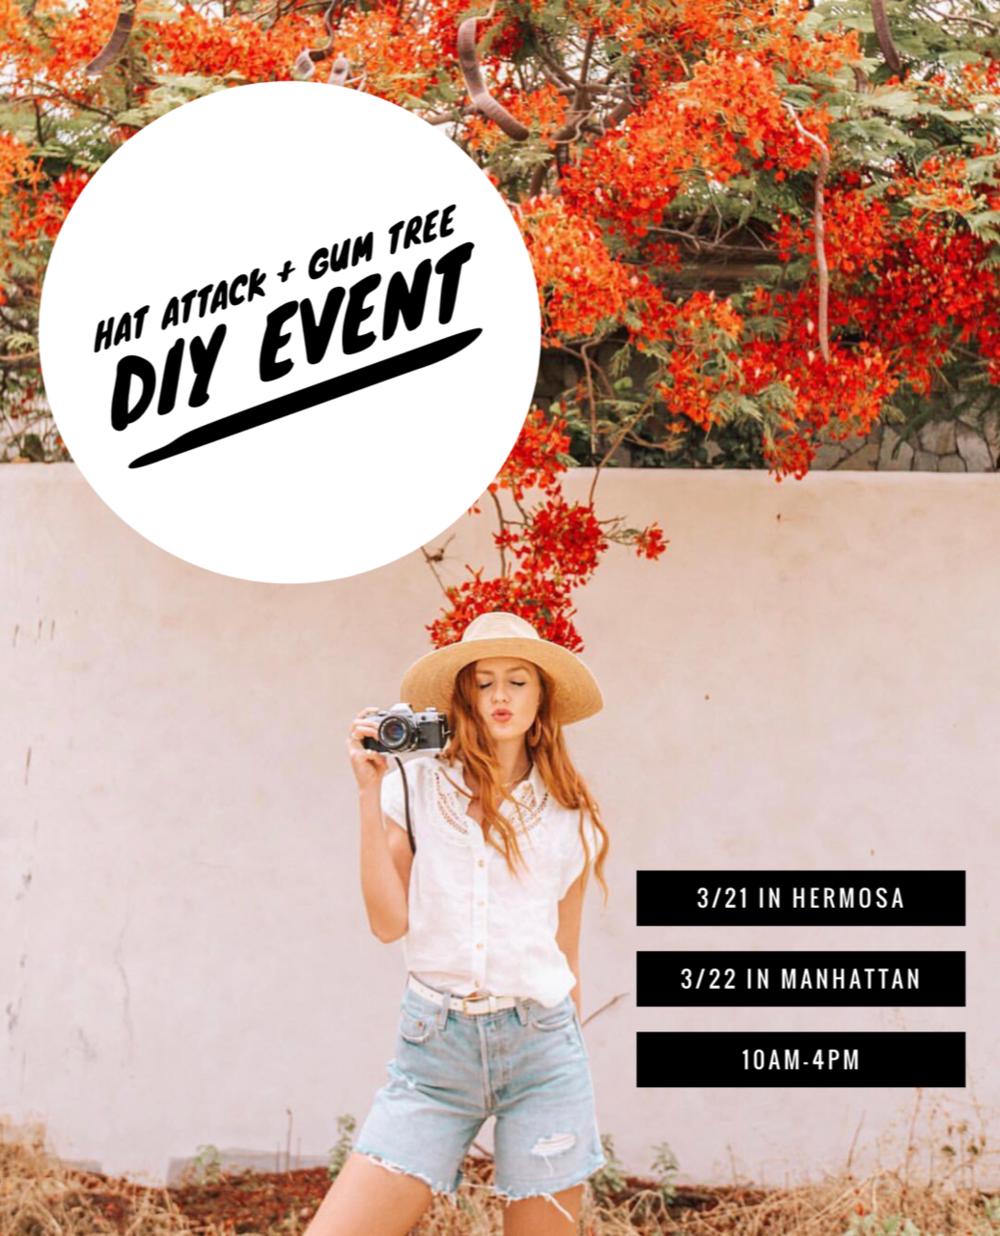 diy_event_2019.png